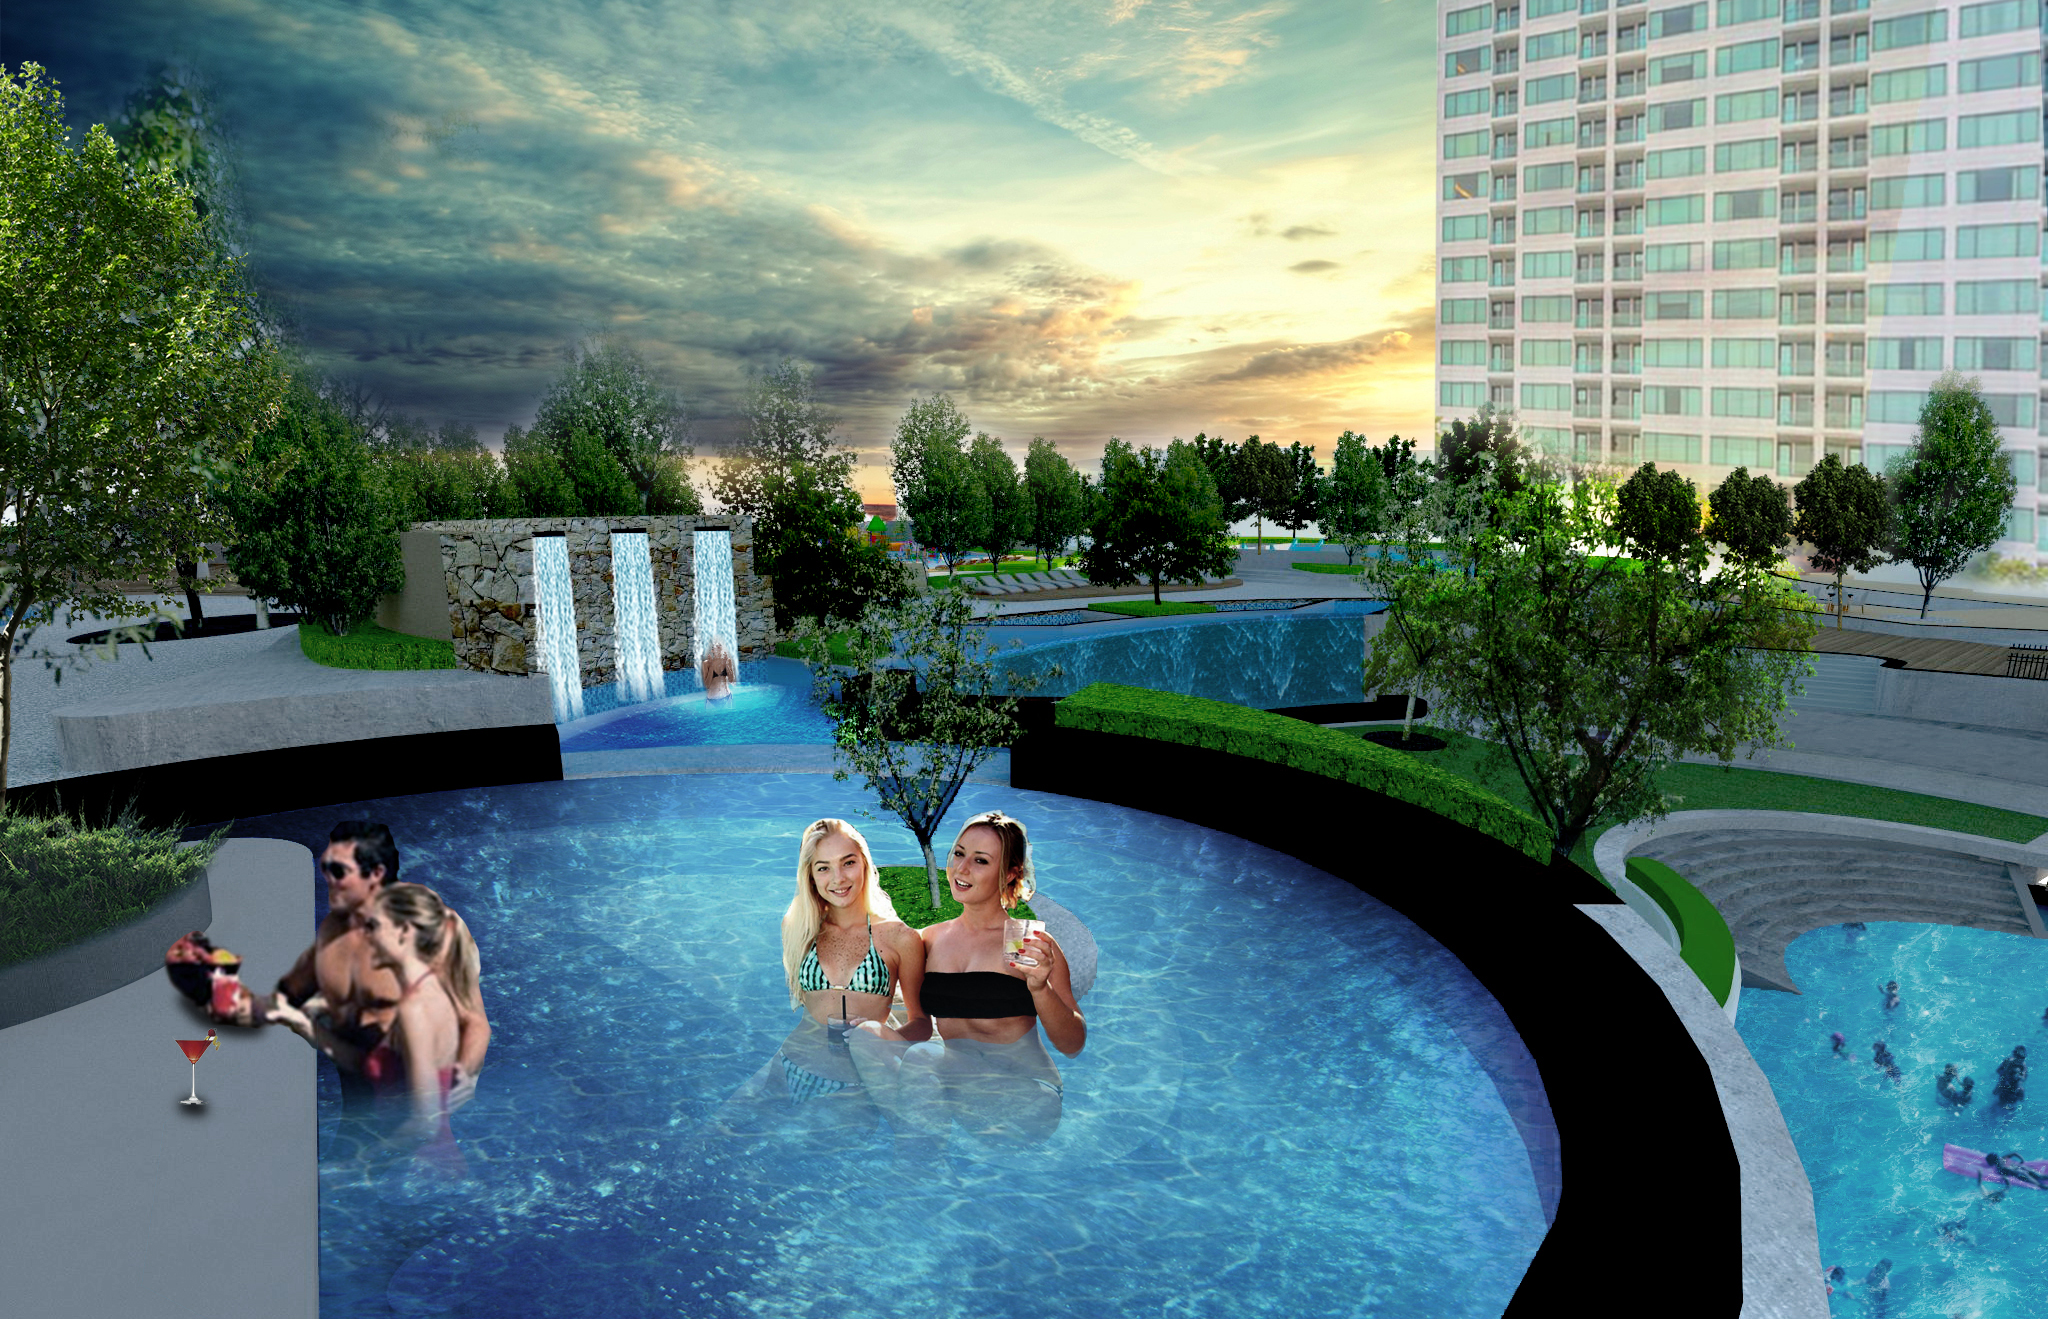 Scene 4 Spa pool Retouch